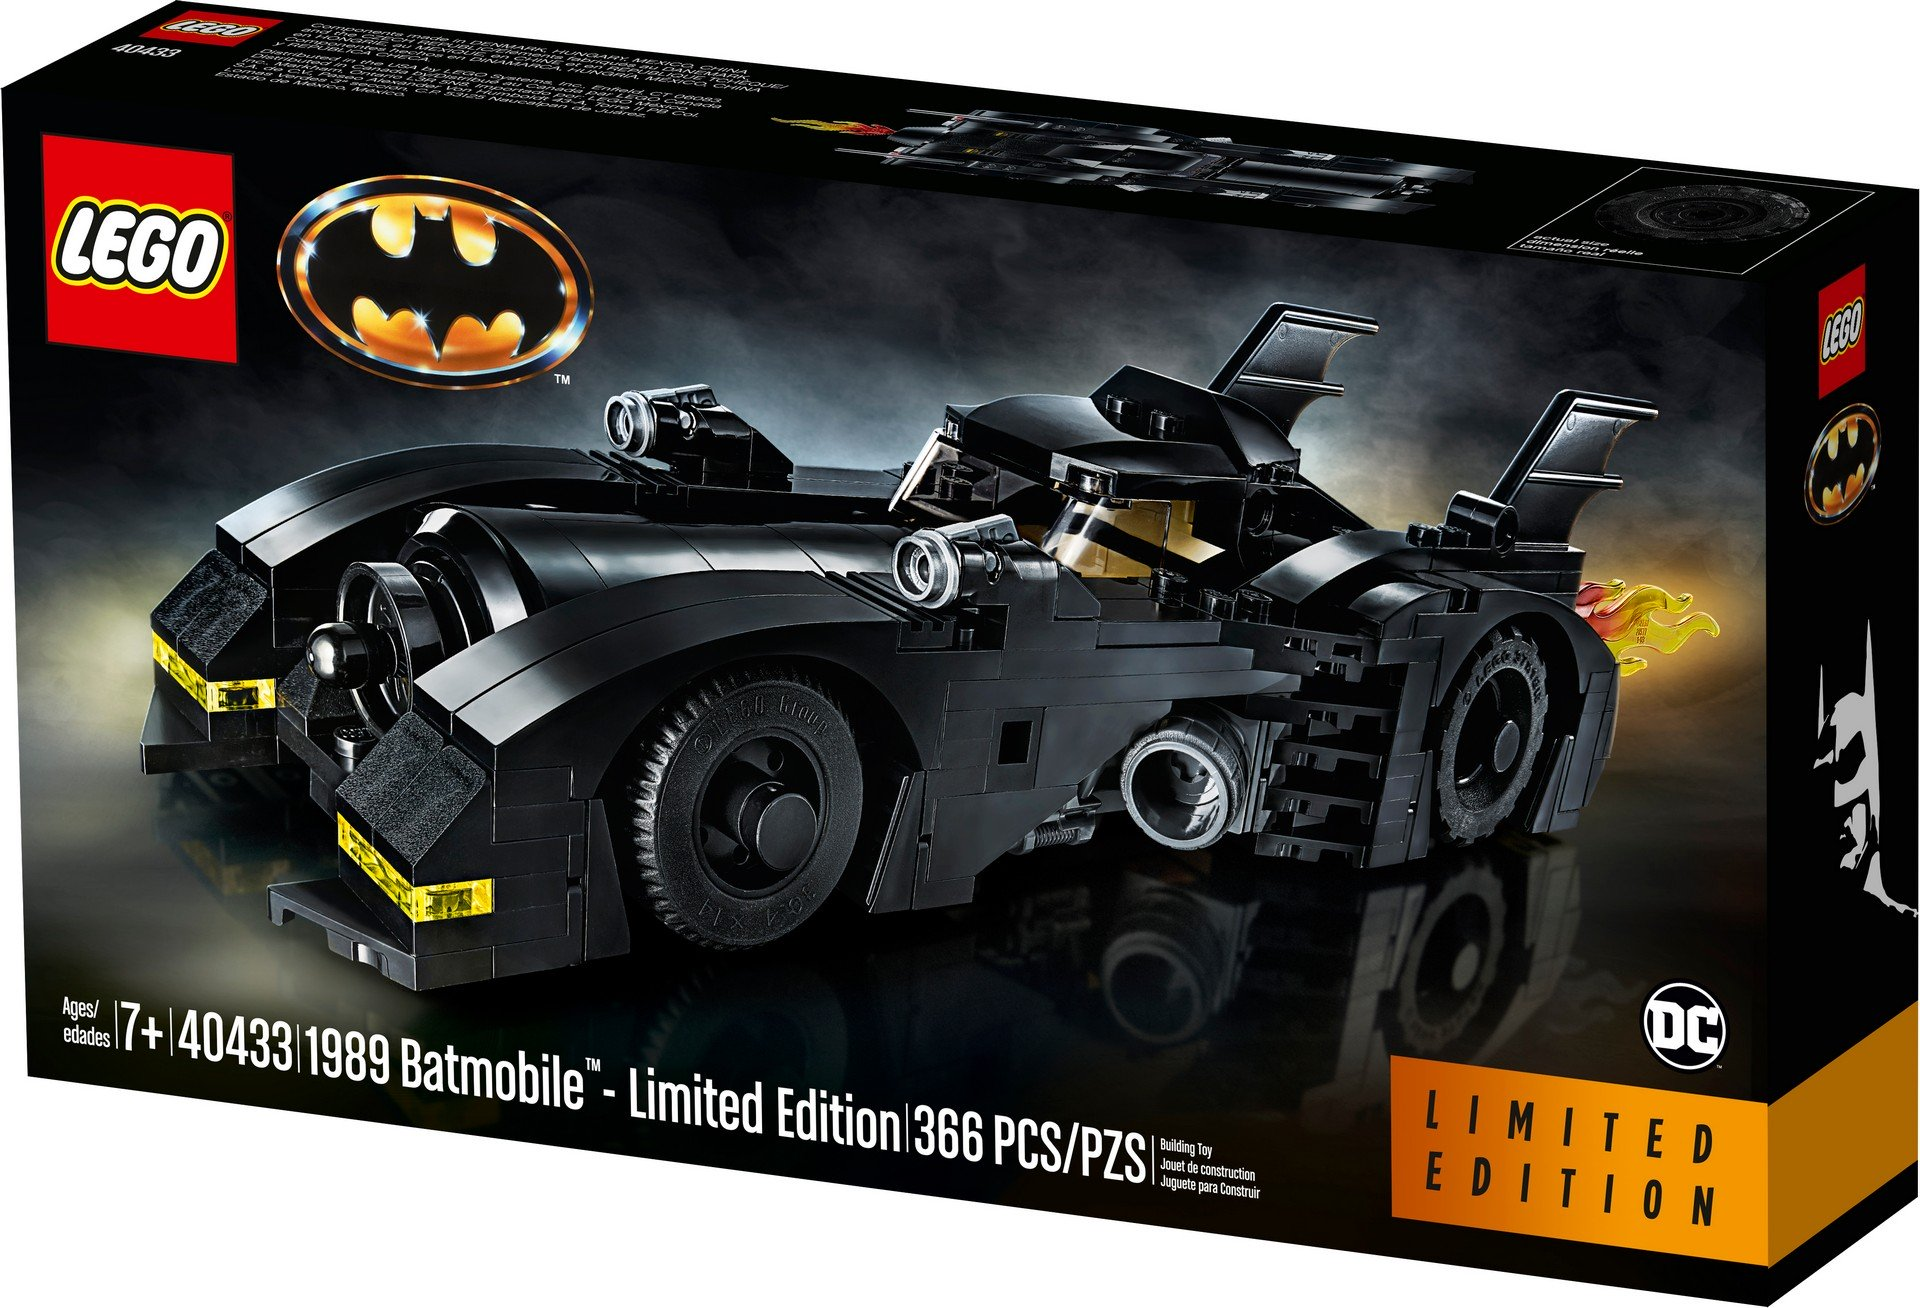 Lego-Batmobile-kit-1989-12